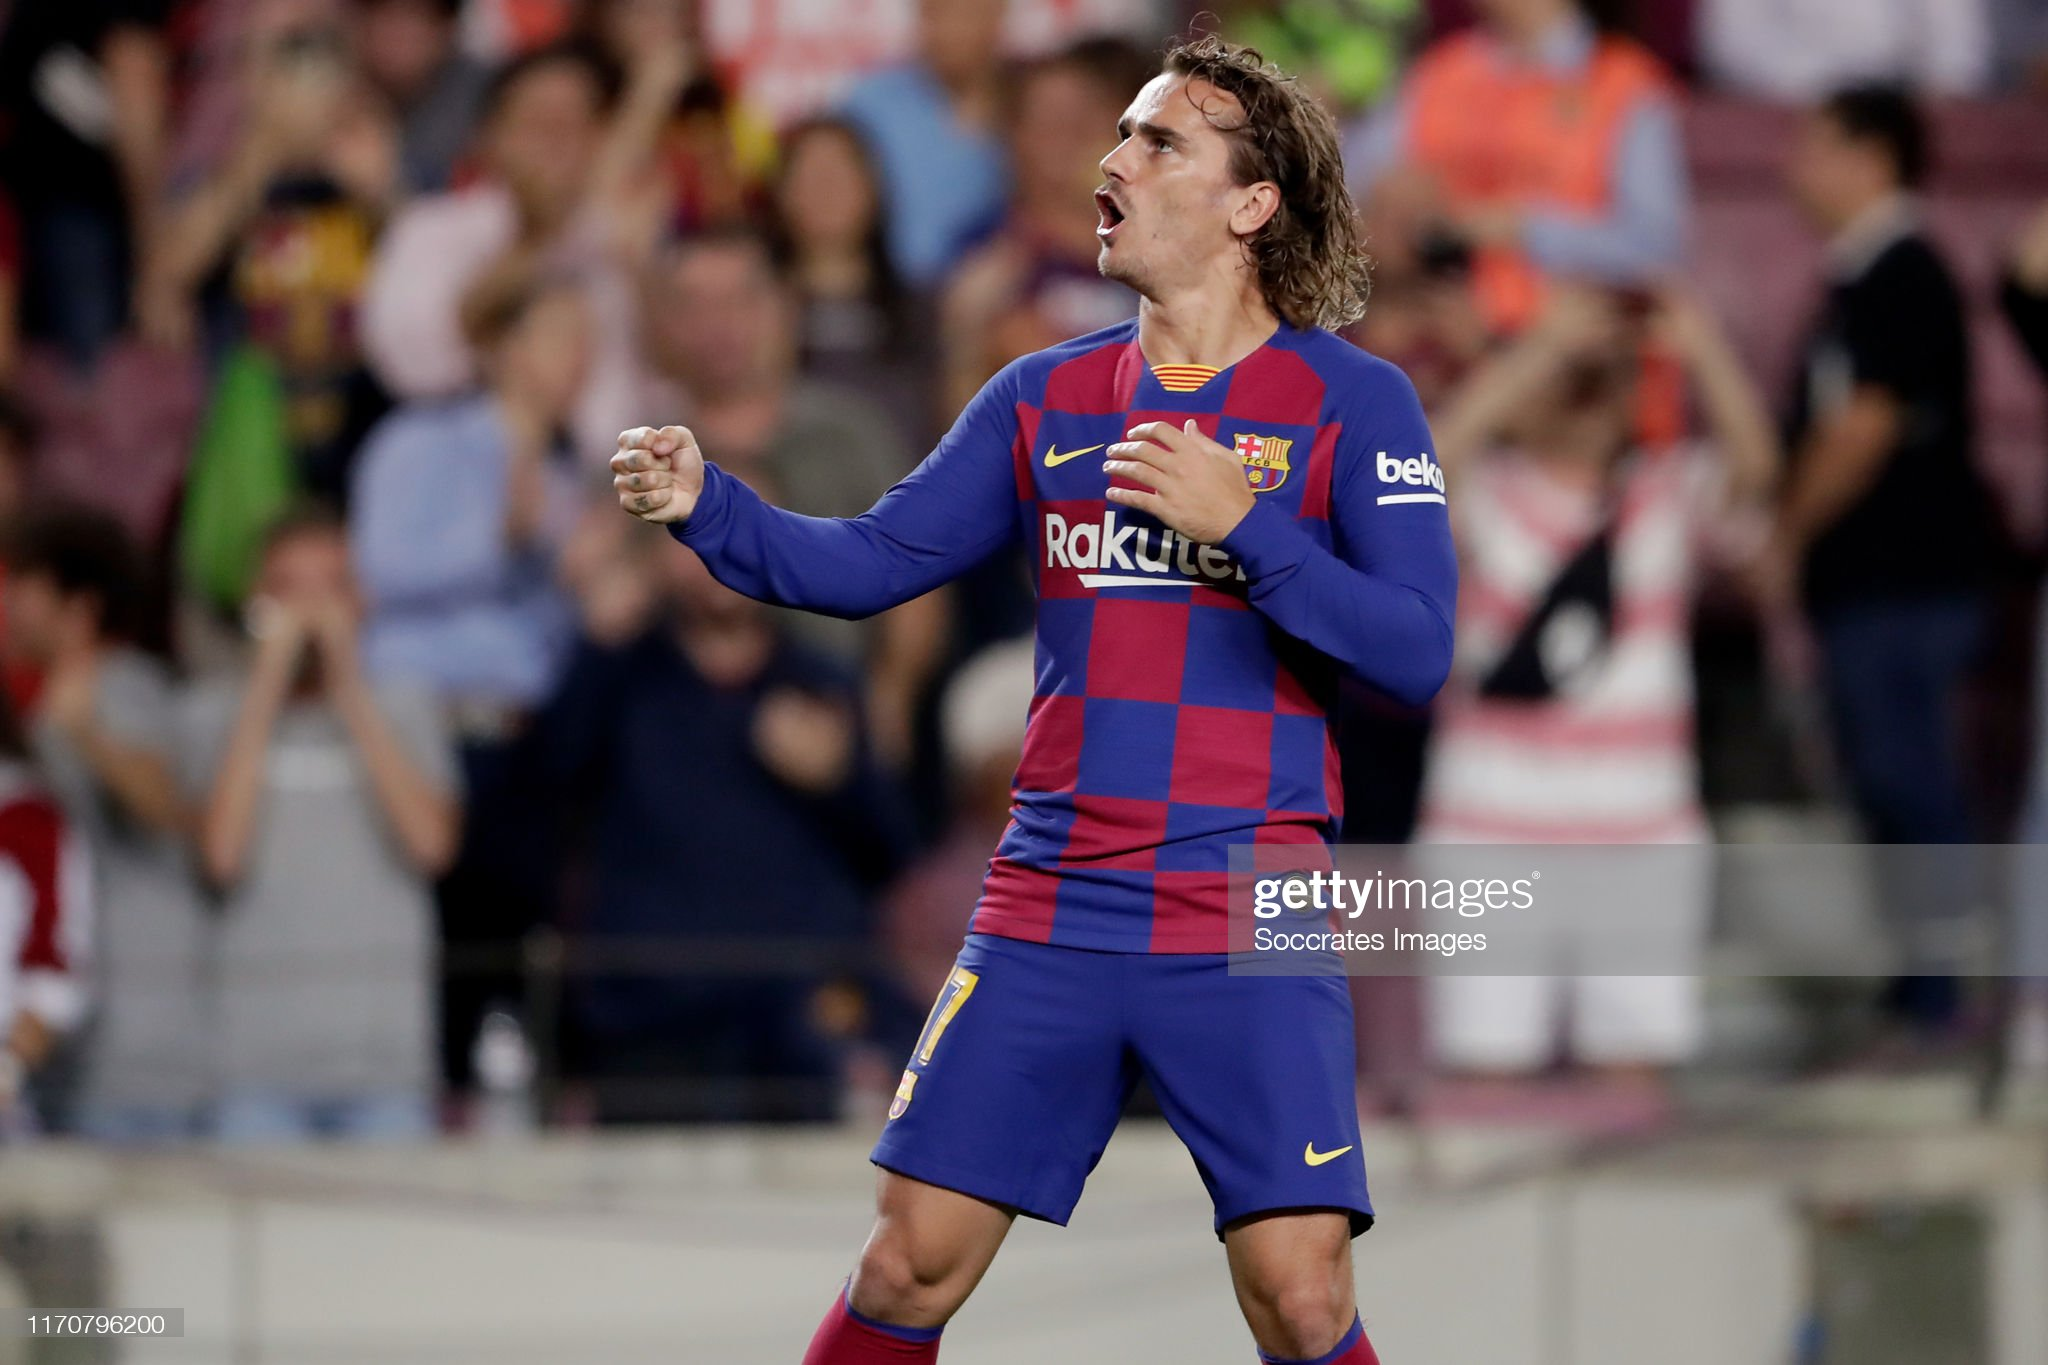 صور مباراة : برشلونة - فياريال 2-1 ( 24-09-2019 )  Antoine-griezmann-of-fc-barcelona-celebrates-20-during-the-la-liga-picture-id1170796200?s=2048x2048